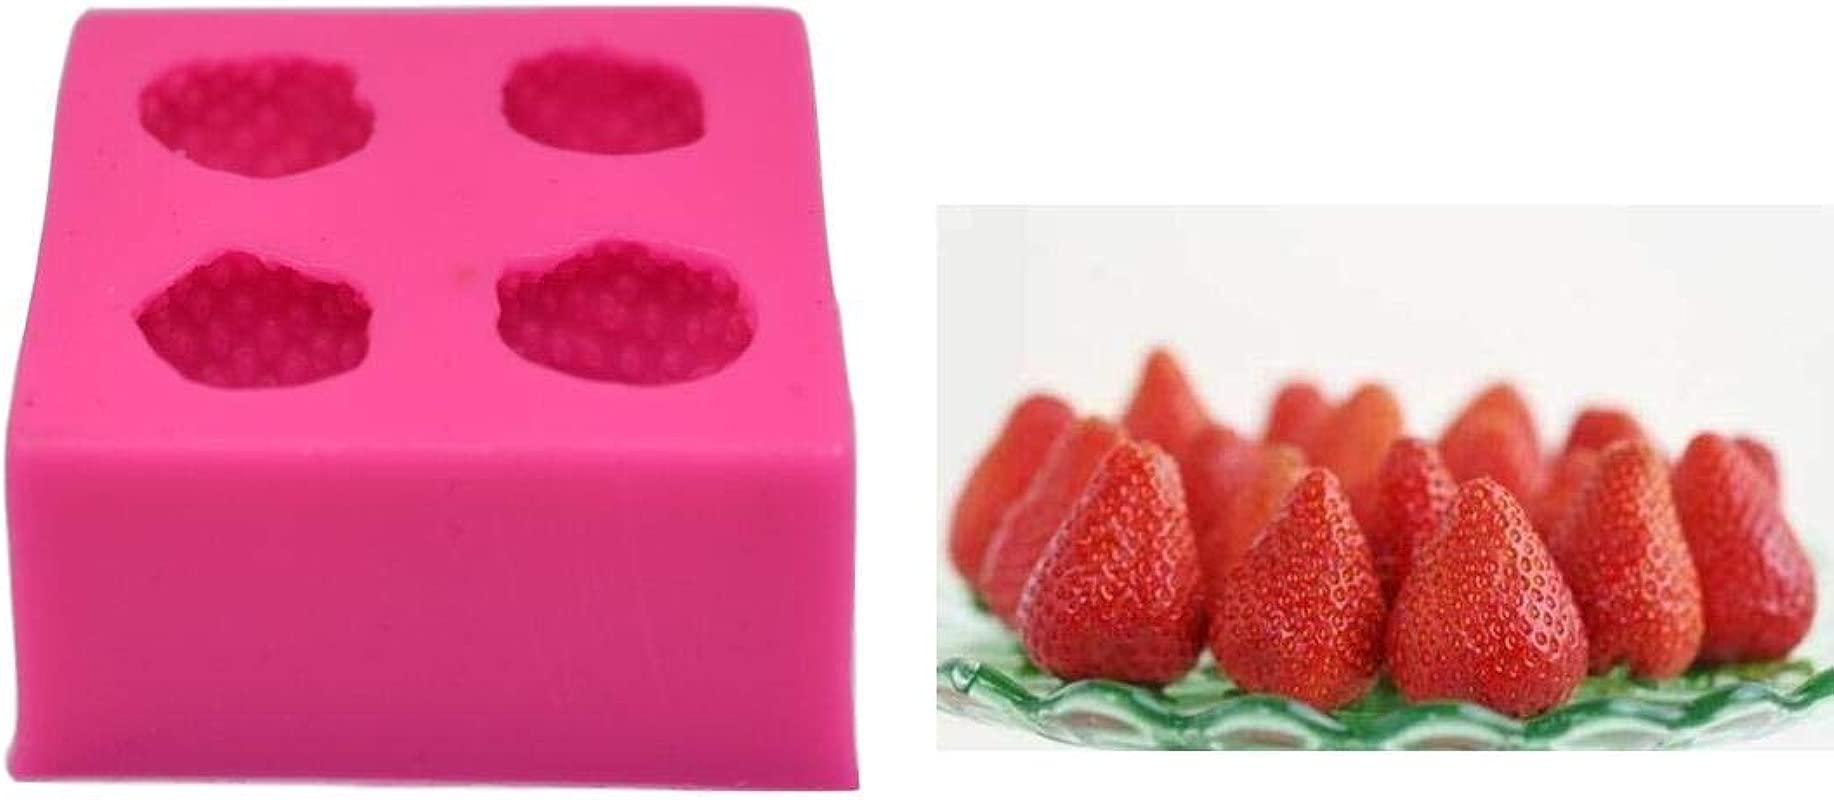 3D Strawberry Silicone Mold Fondant Cake Mold Chocolate Mold Cake Decoration